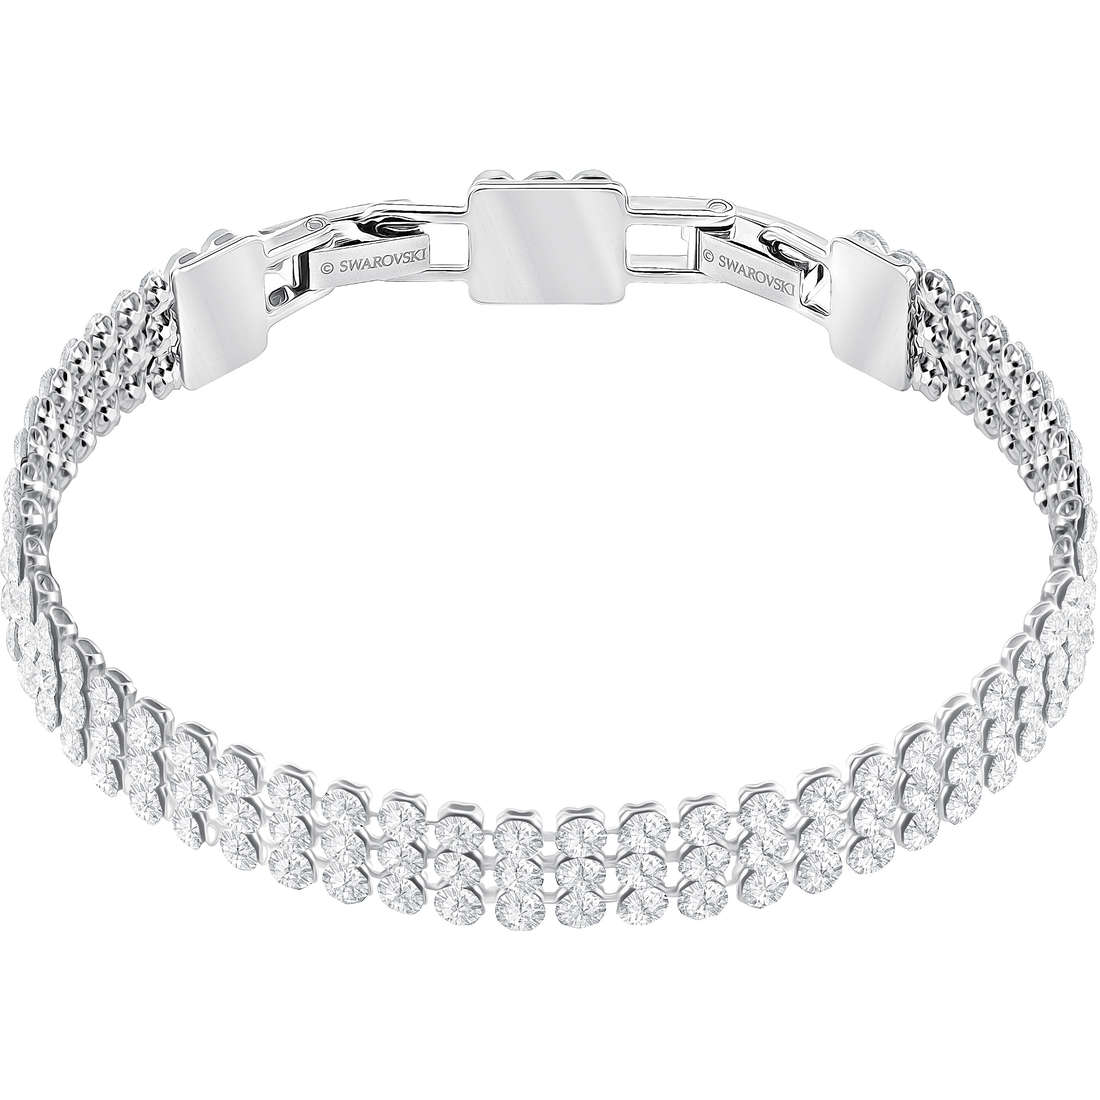 84b4f7190972f1 bracciale donna gioielli Swarovski Fit 5363516 bracciali Swarovski